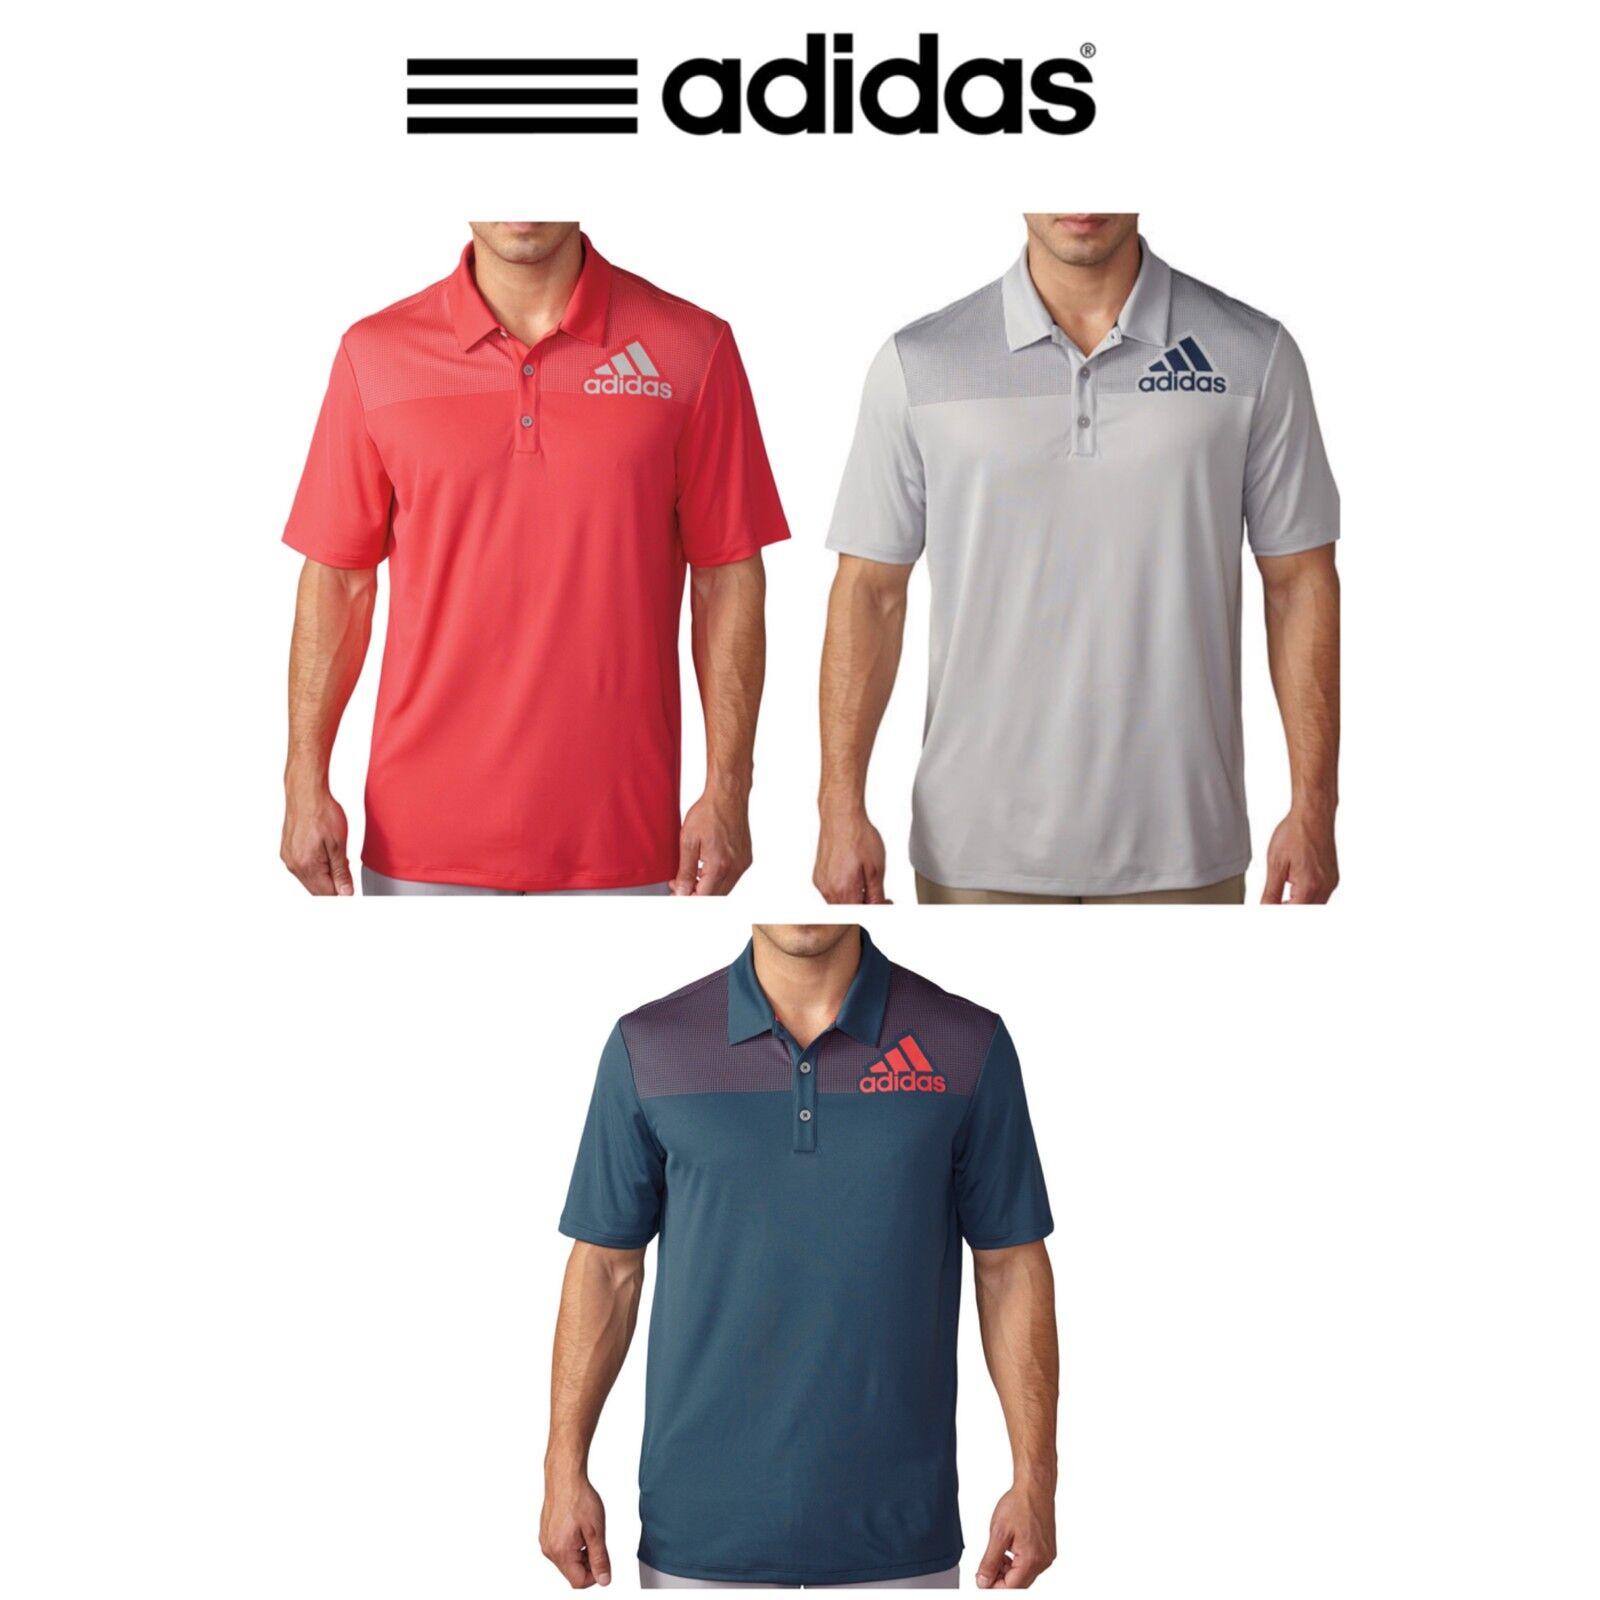 Adidas Big Logo Dot Print Mens Golf Polo Shirt Ebay